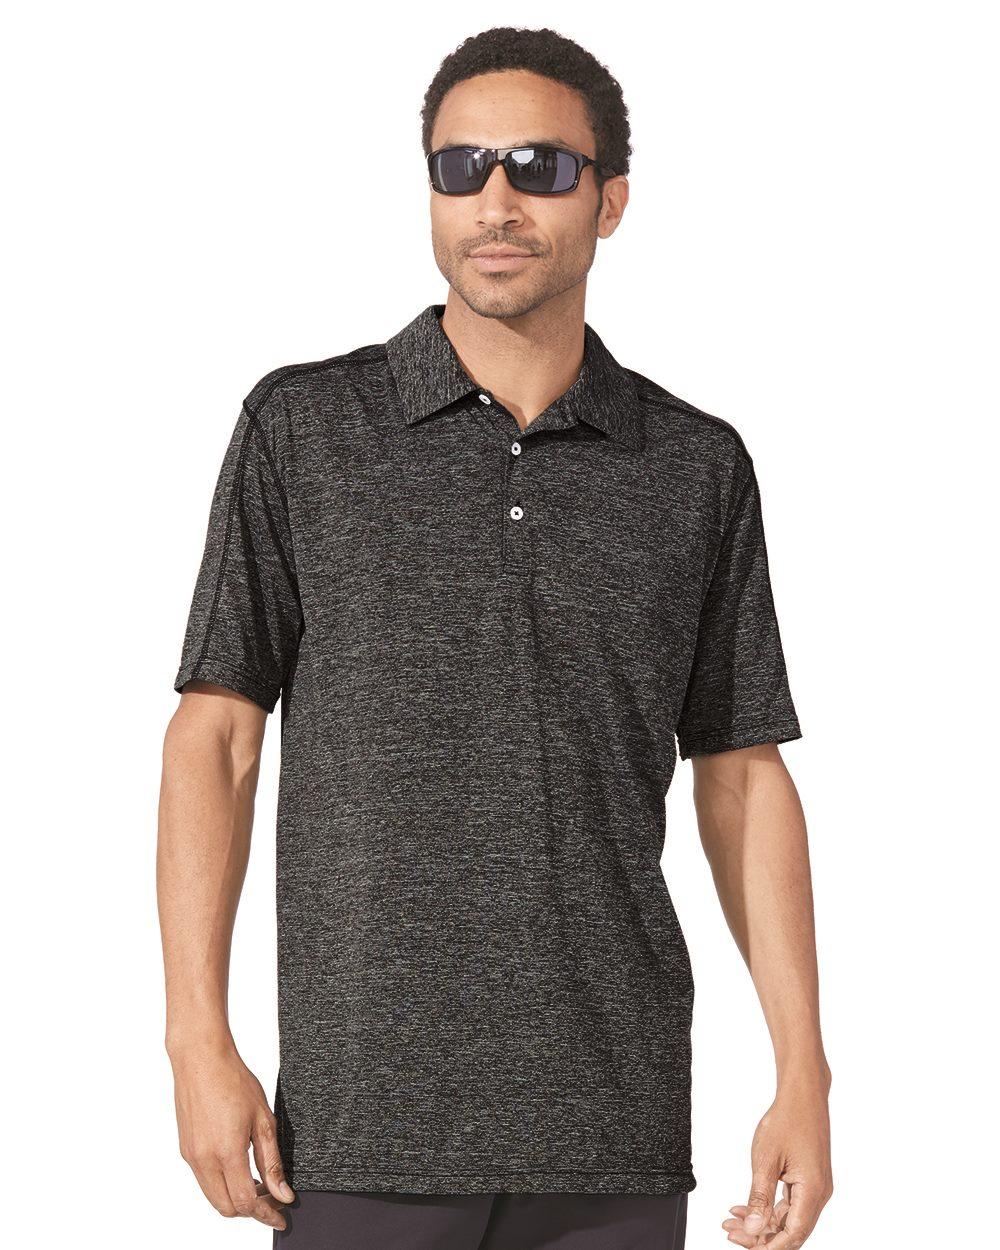 FeatherLite - Value Cationic Sport Shirt blue dot apparel